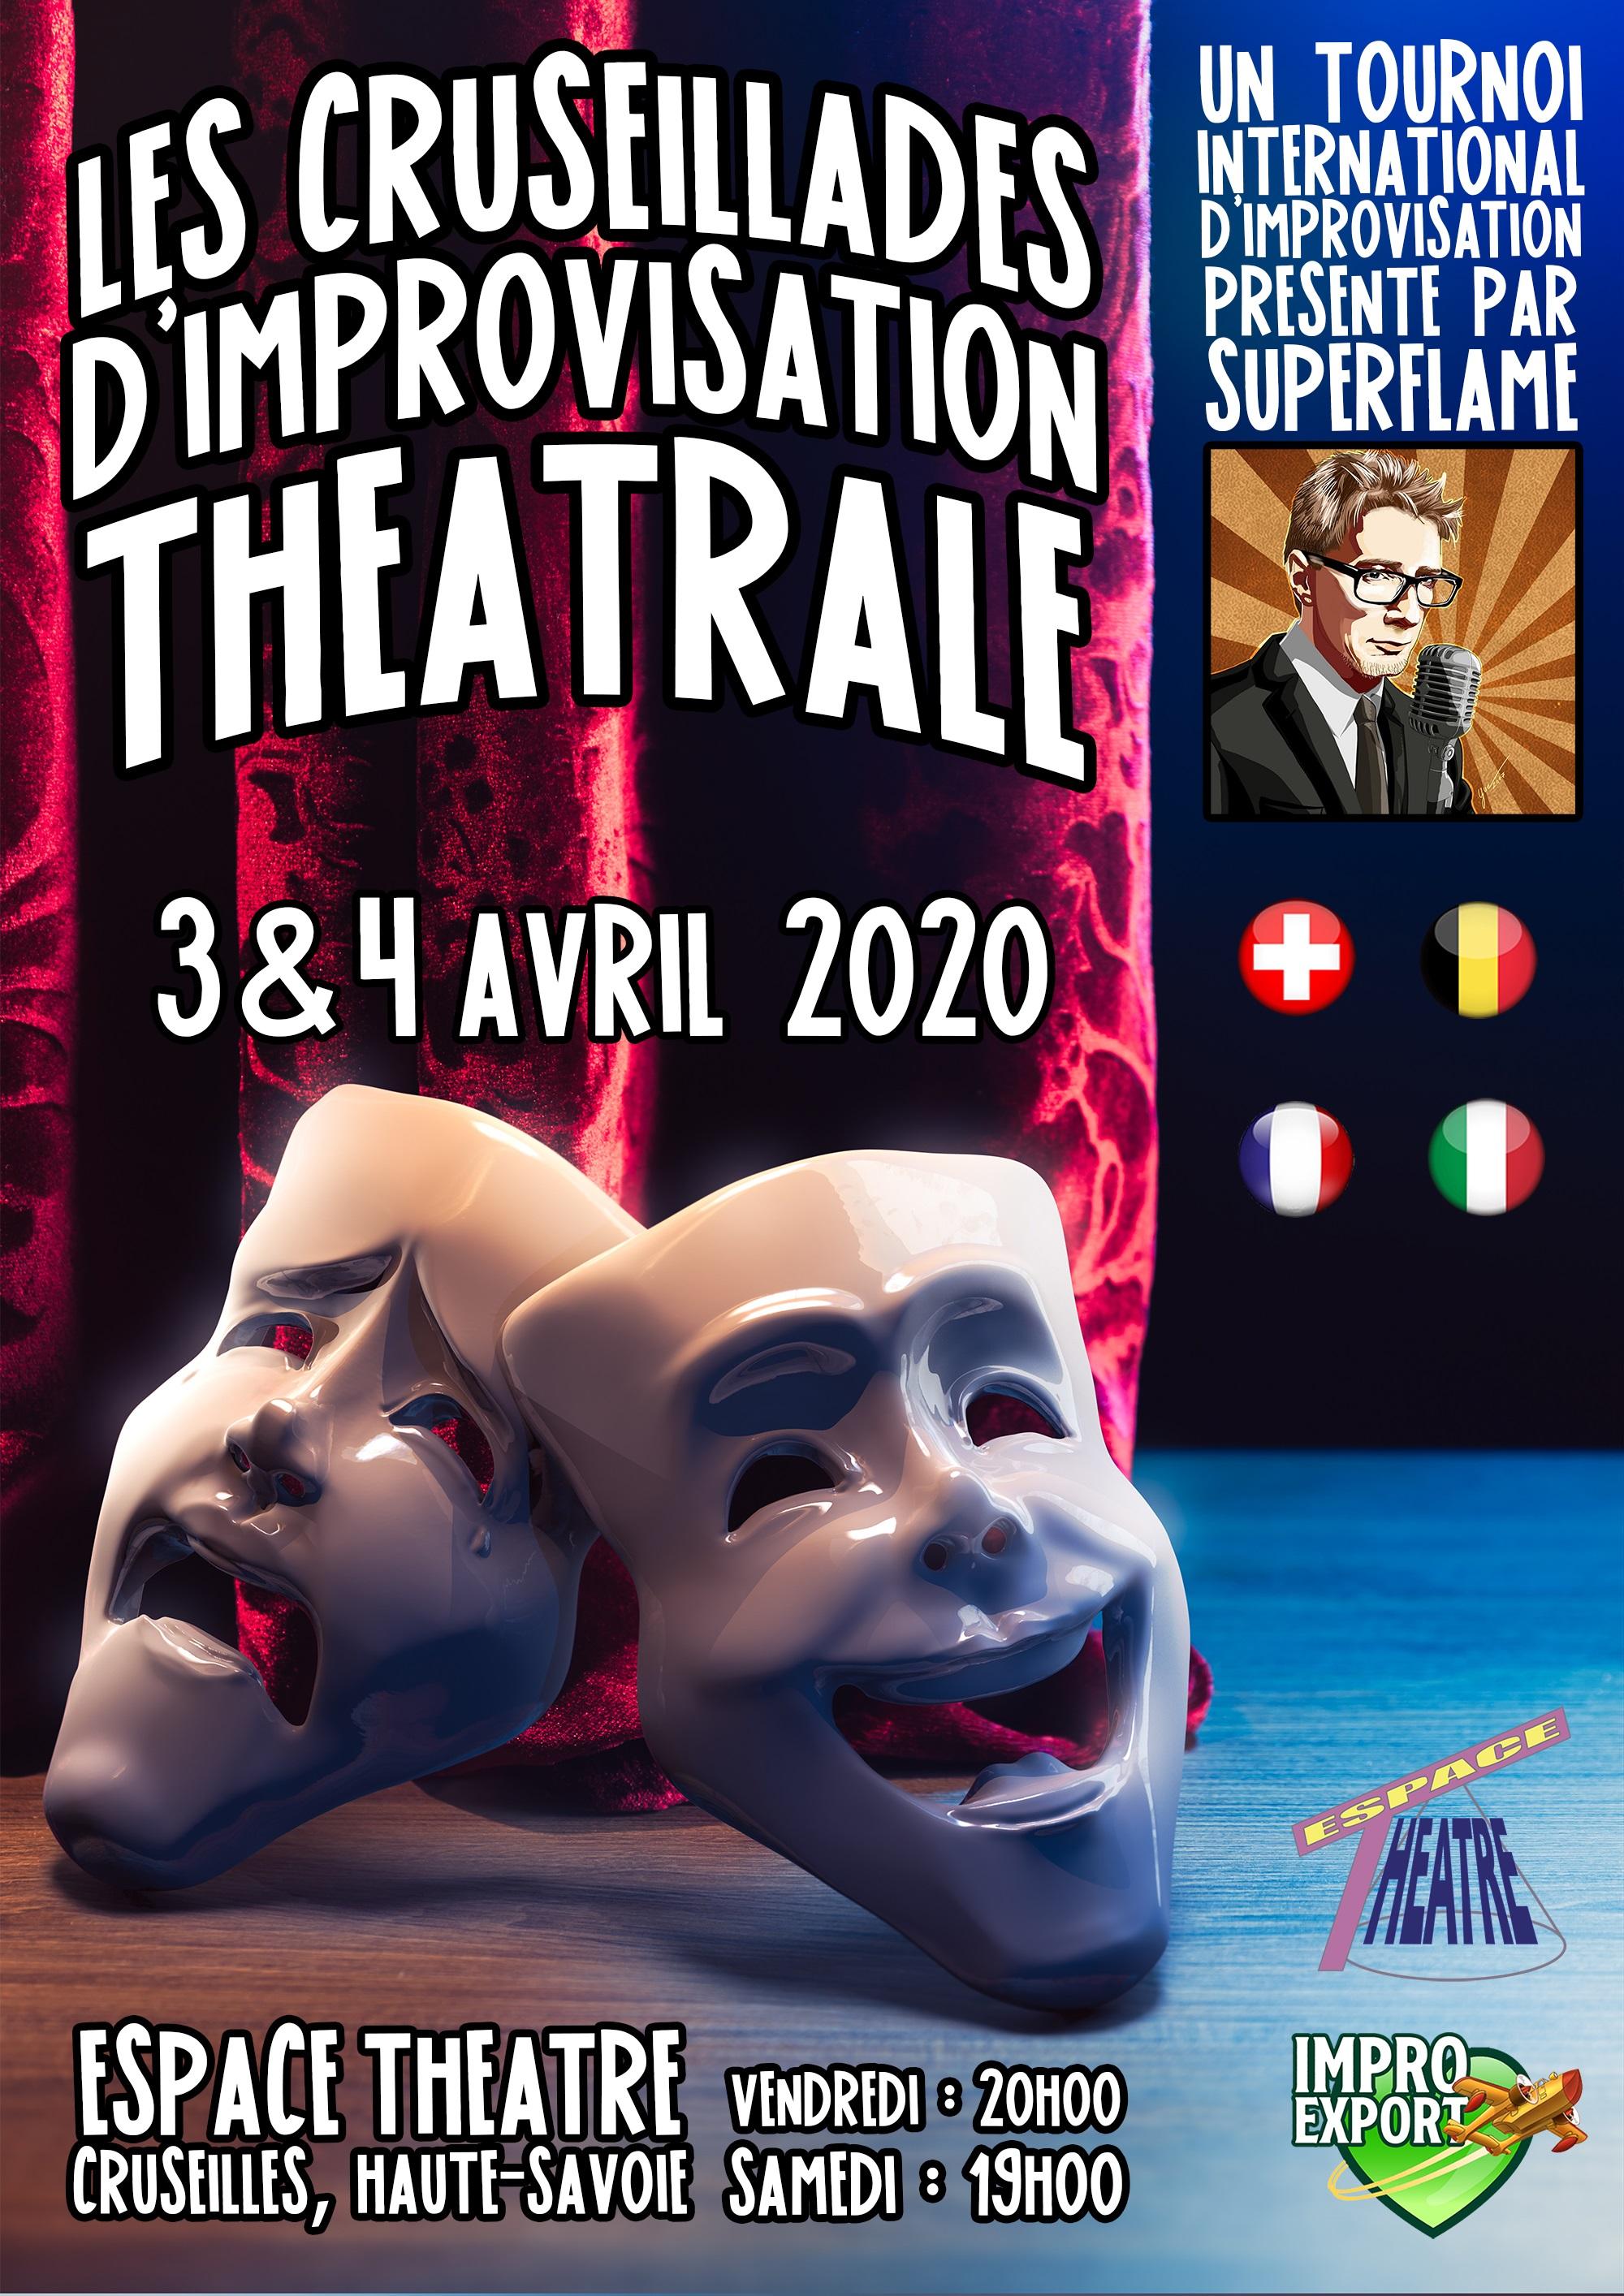 Théâtre -Cruseillades